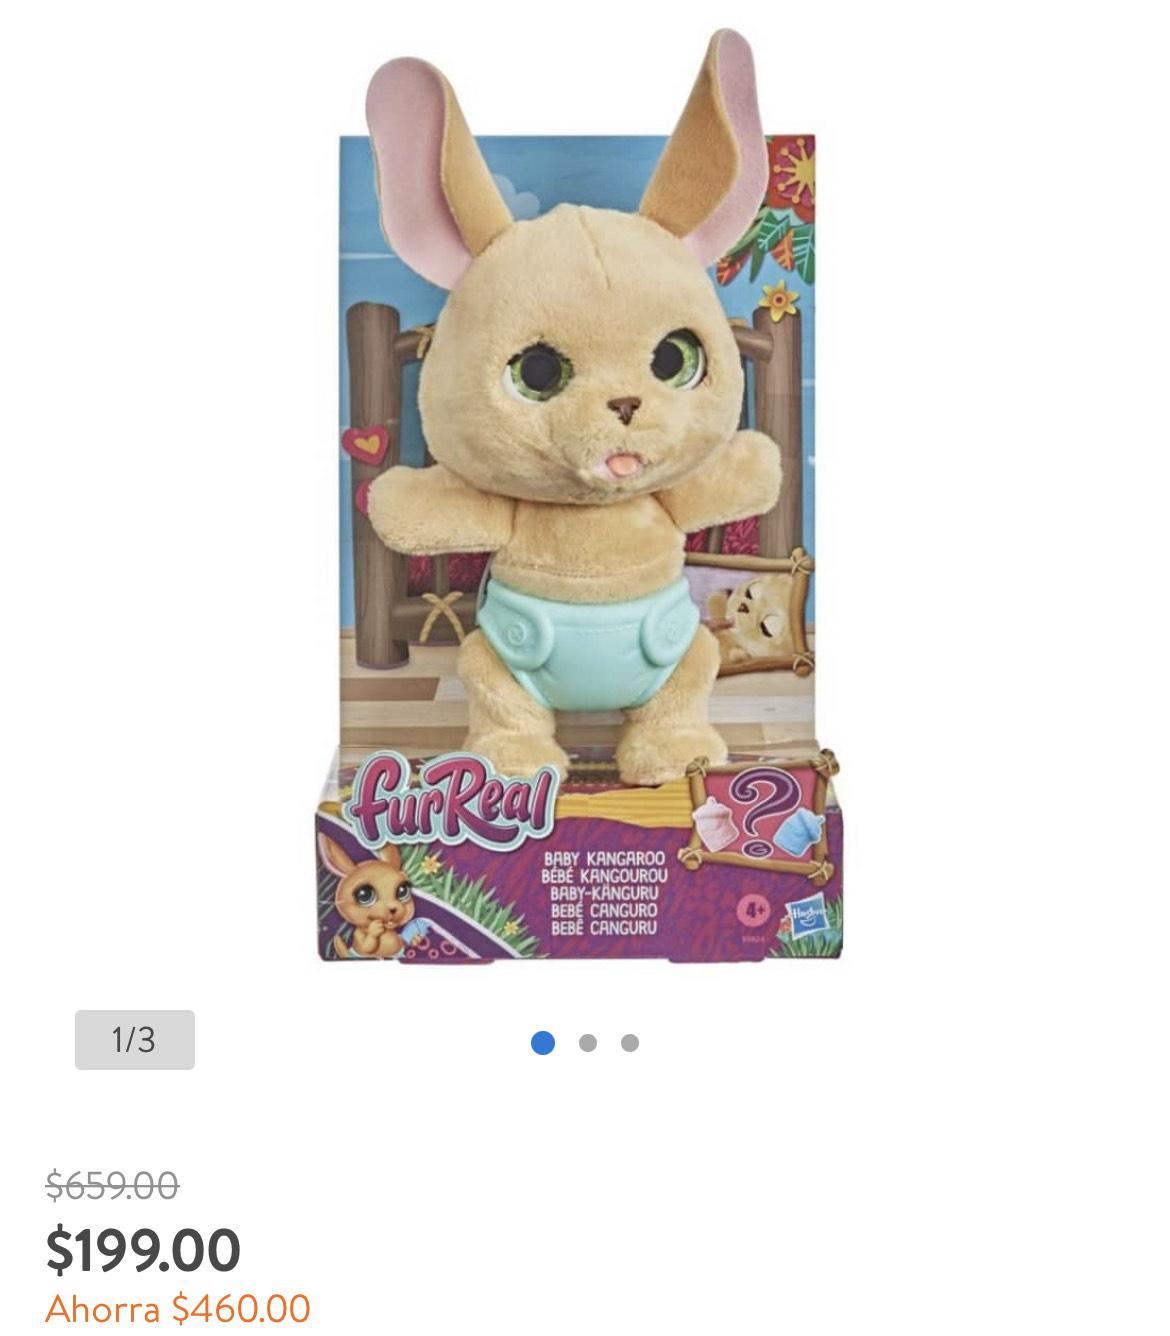 Walmart: Peluche Furreal Hasbro Bebé Canguro